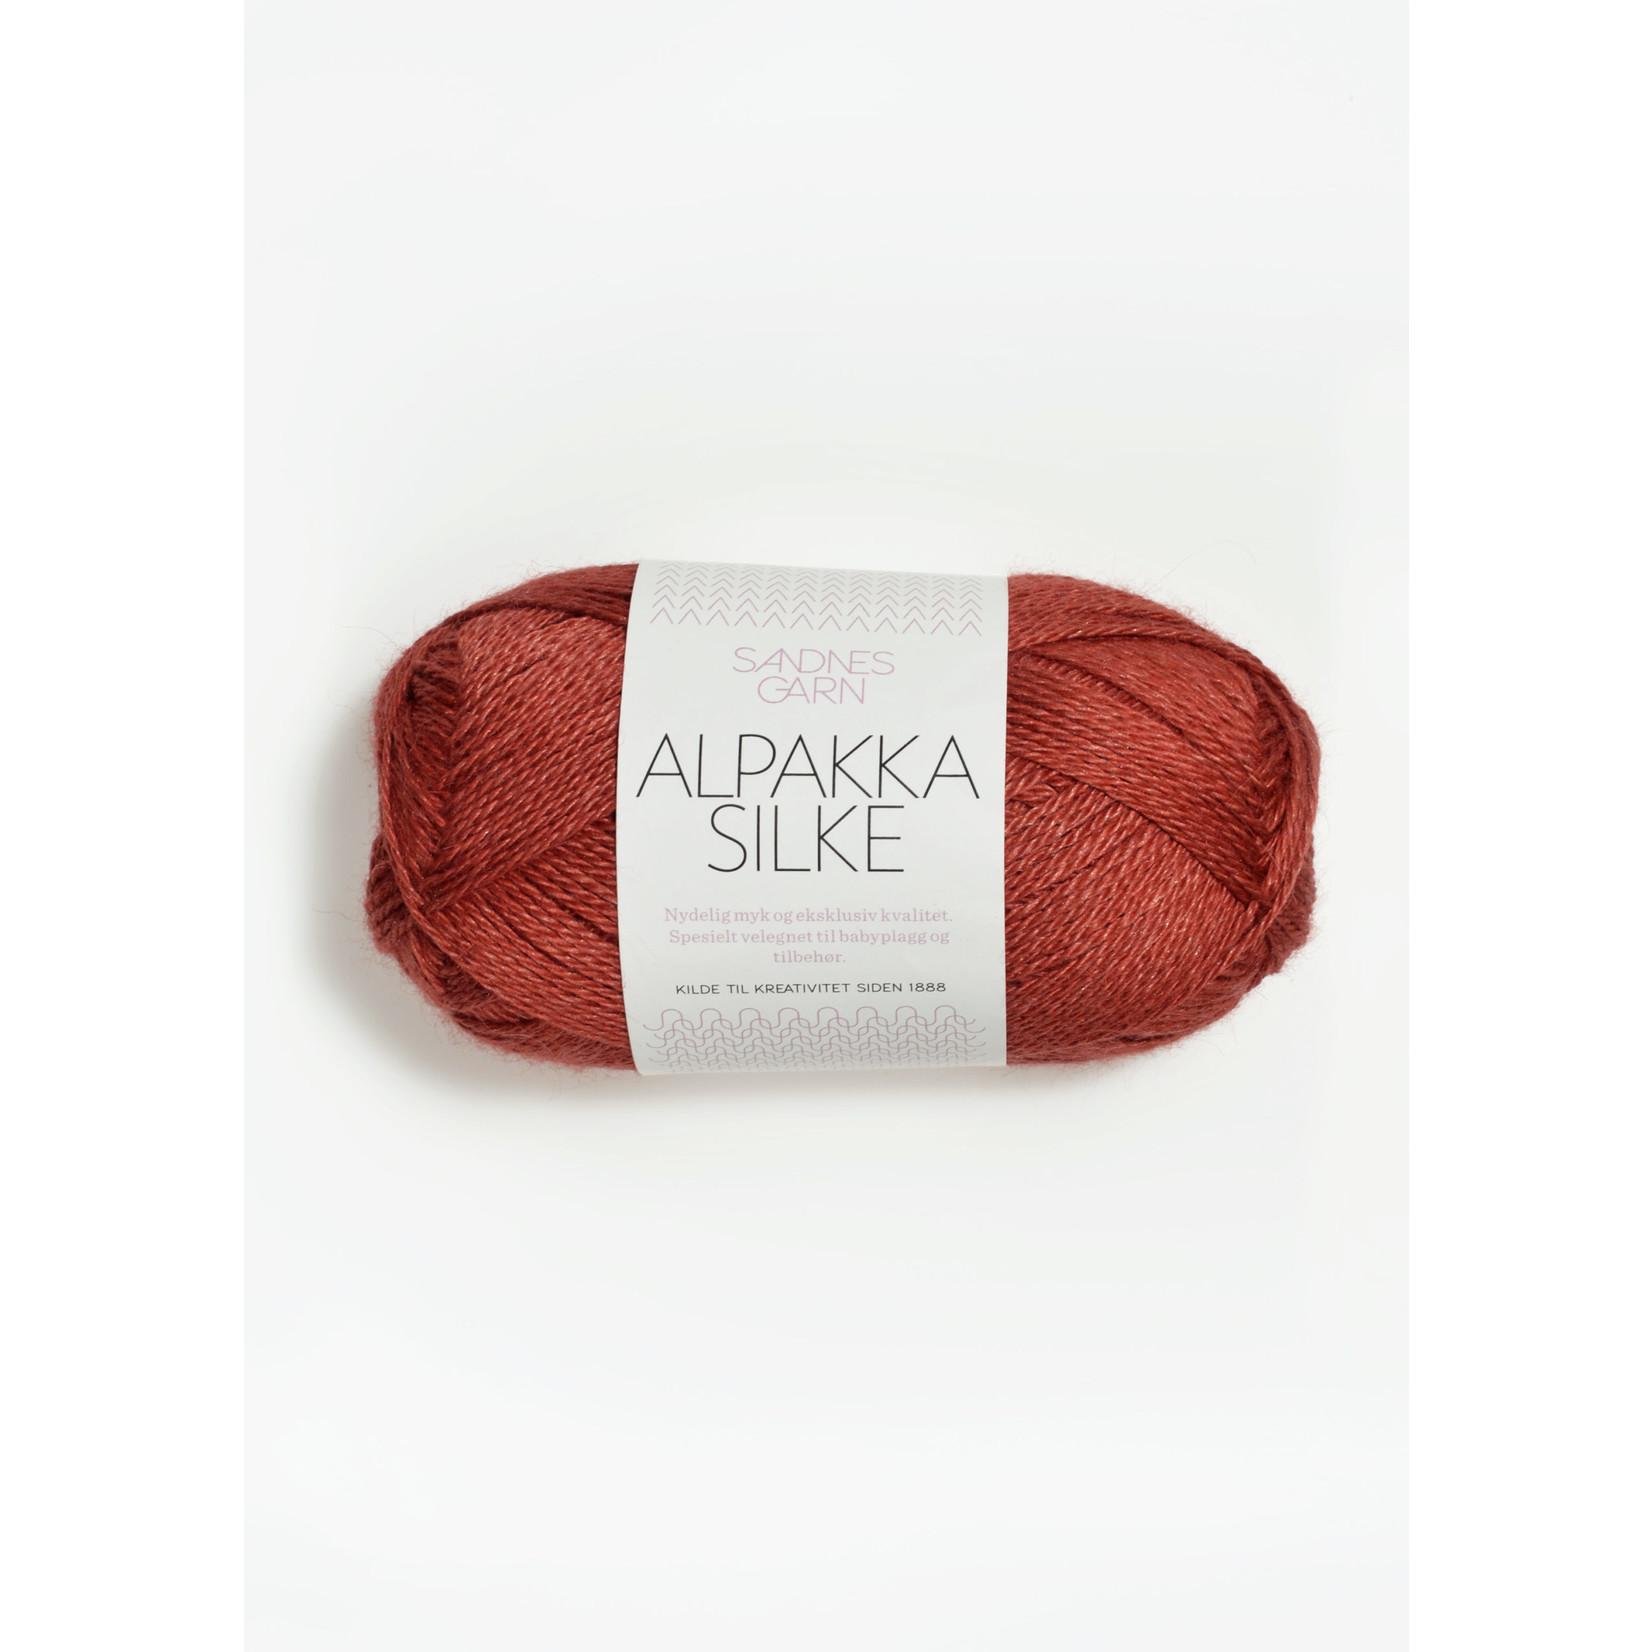 Sandnes Garn Alpakka Silke, 4035, Dark Terracotta